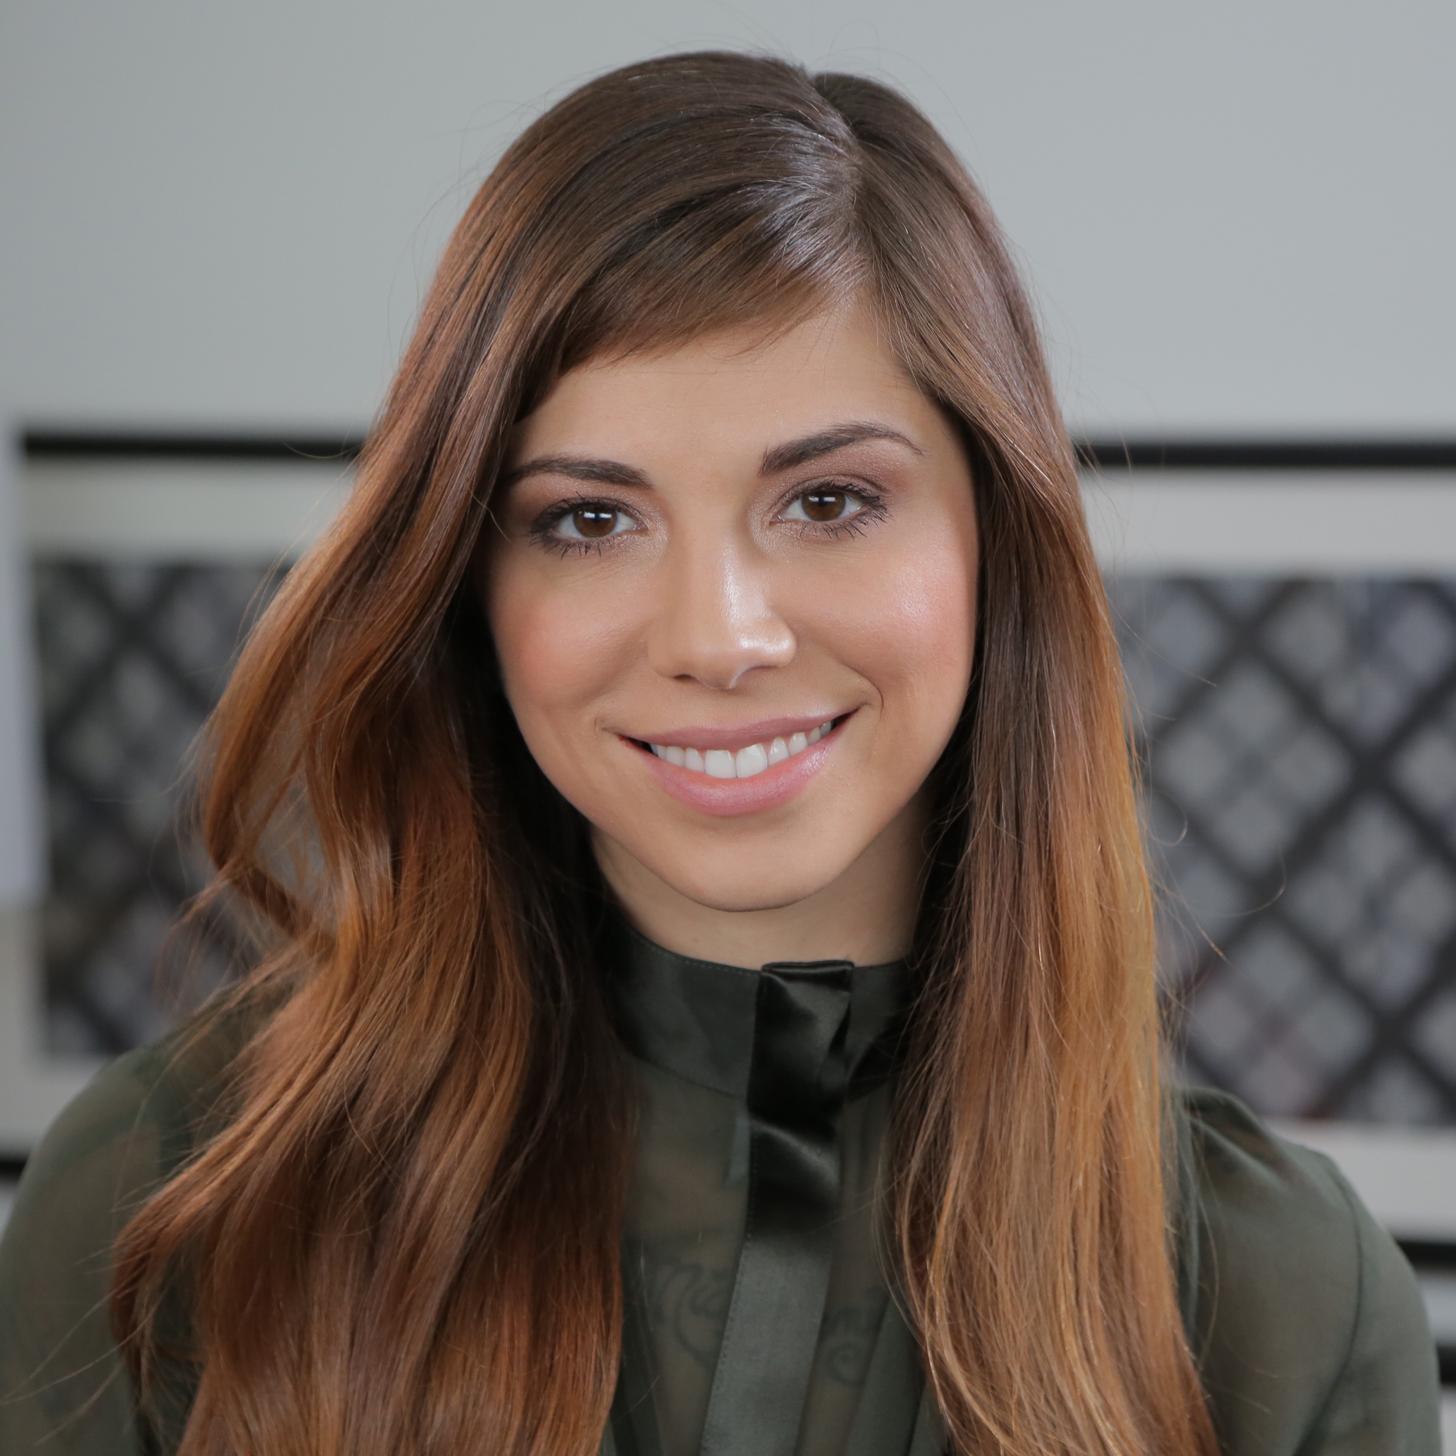 christina perri hair Desktop Backgrounds for HD Wallpaper 1456x1456